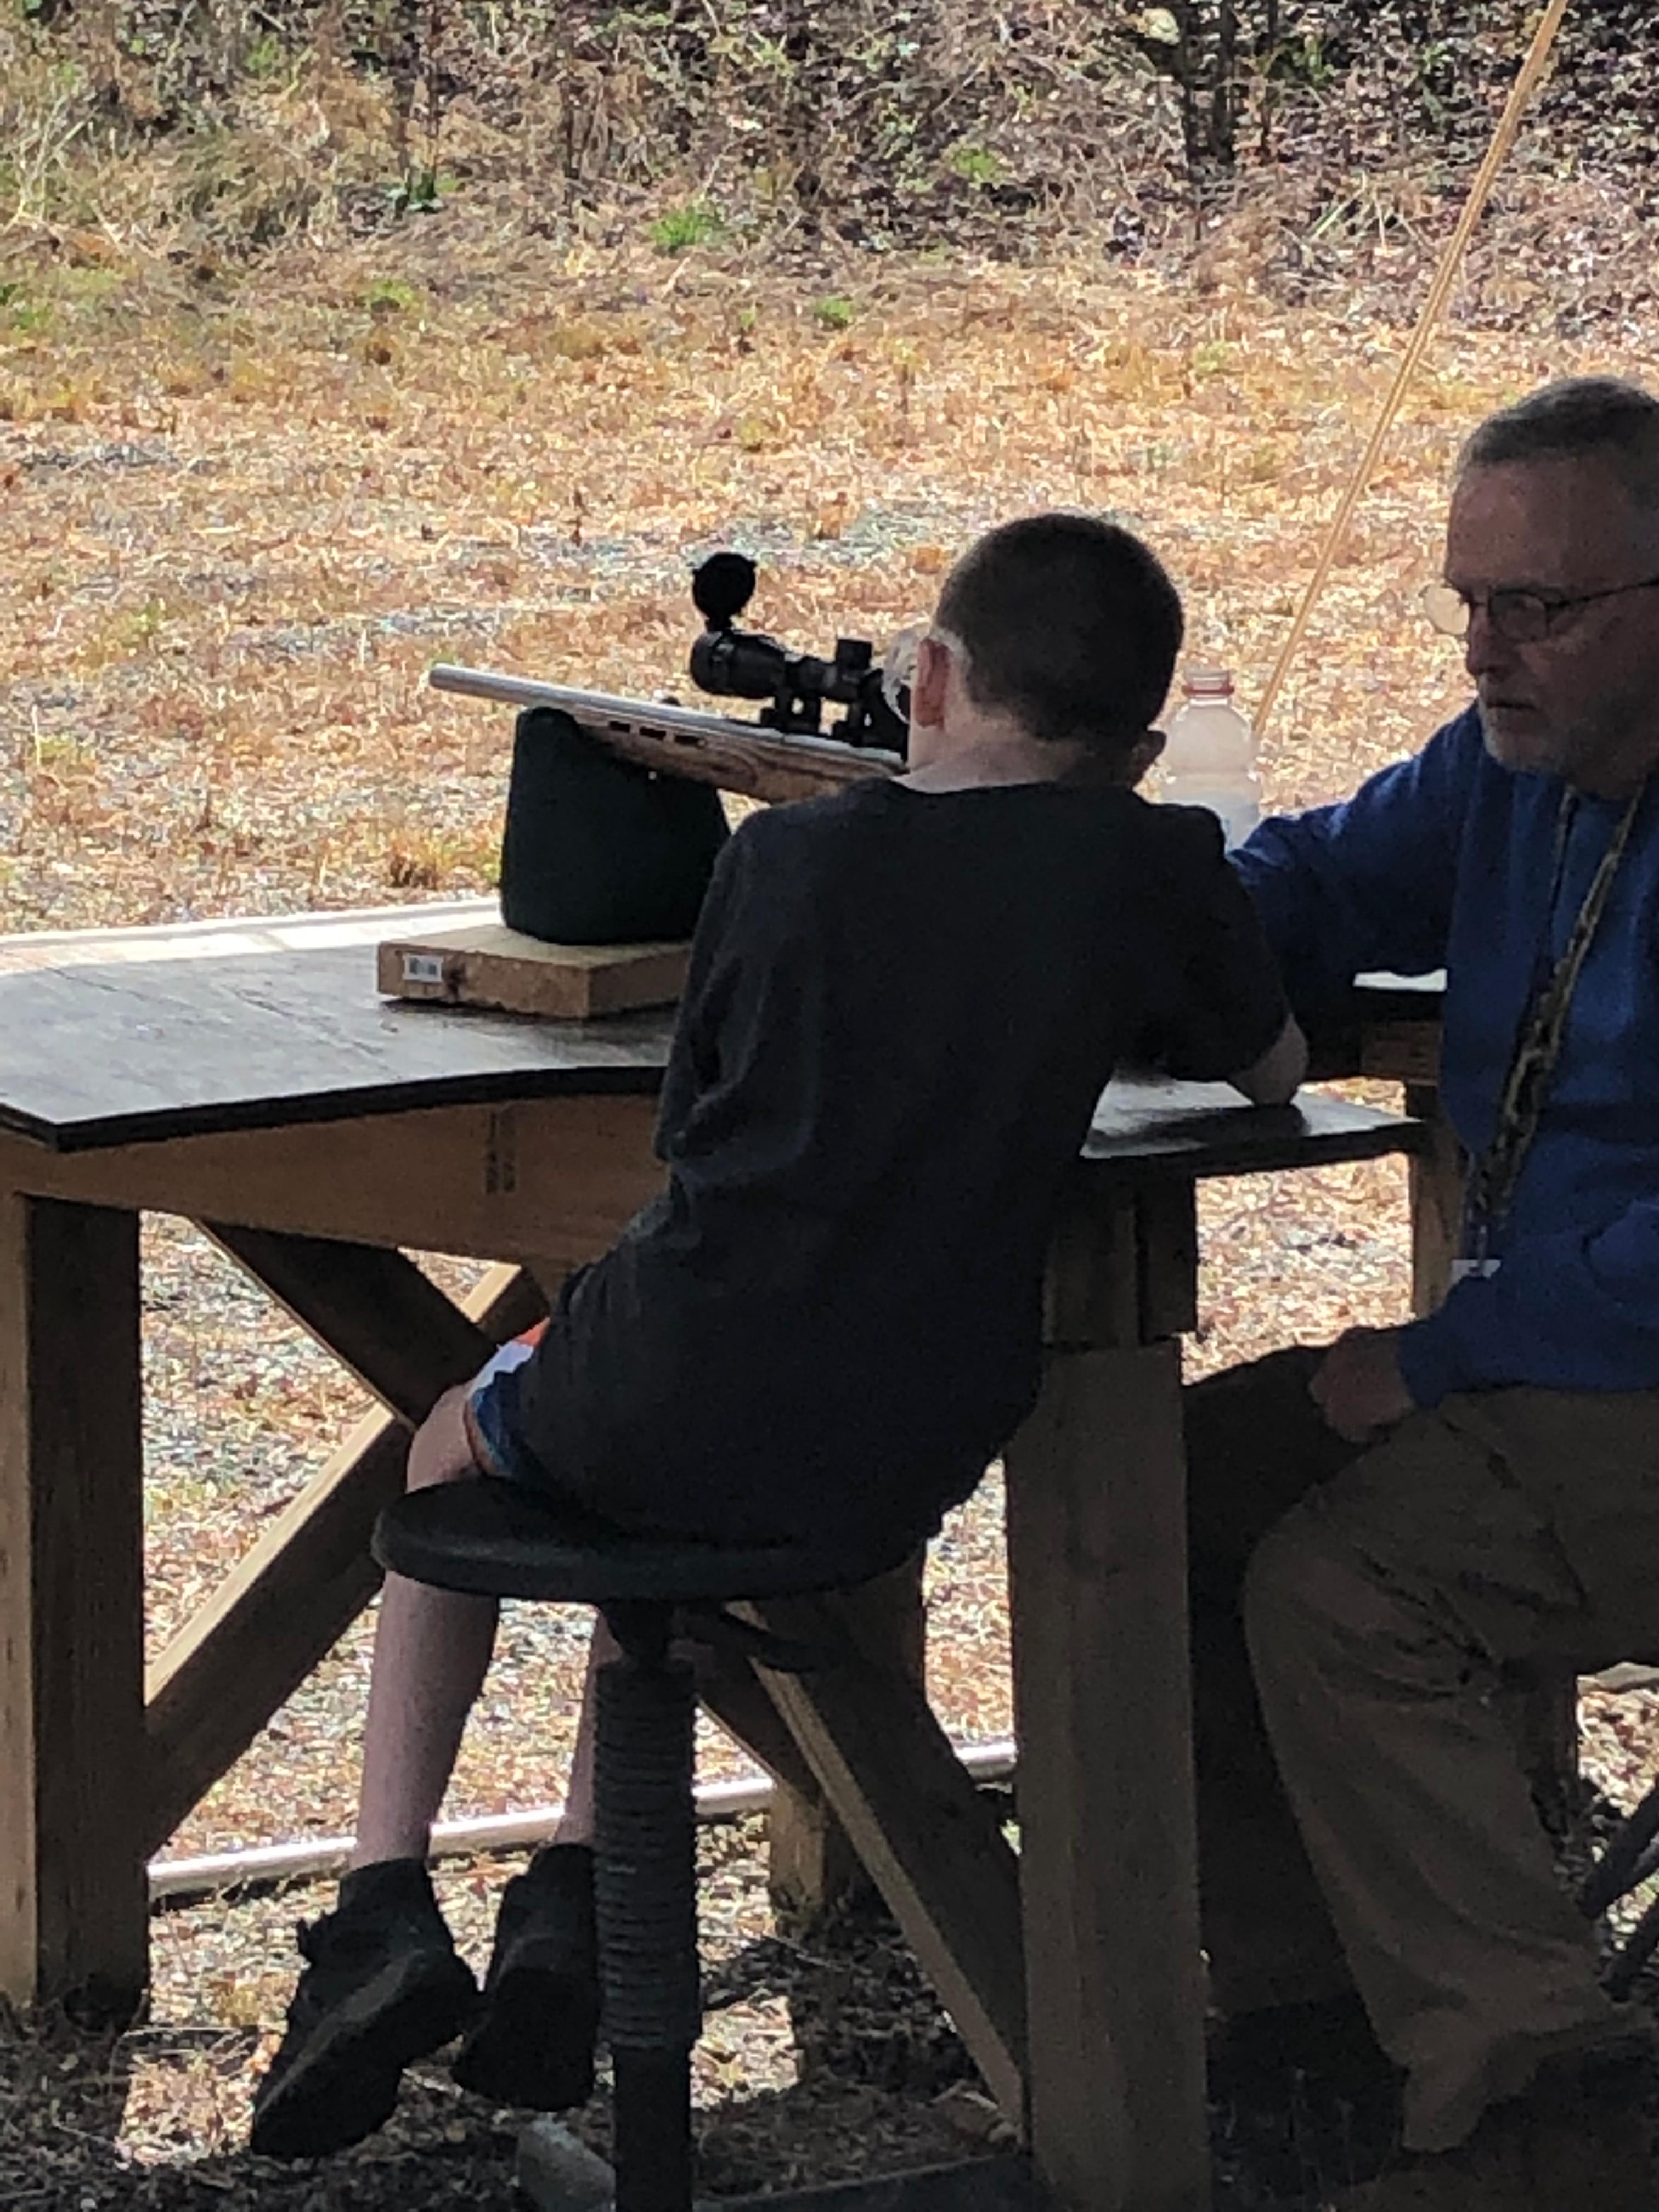 T179 Shooting 20195